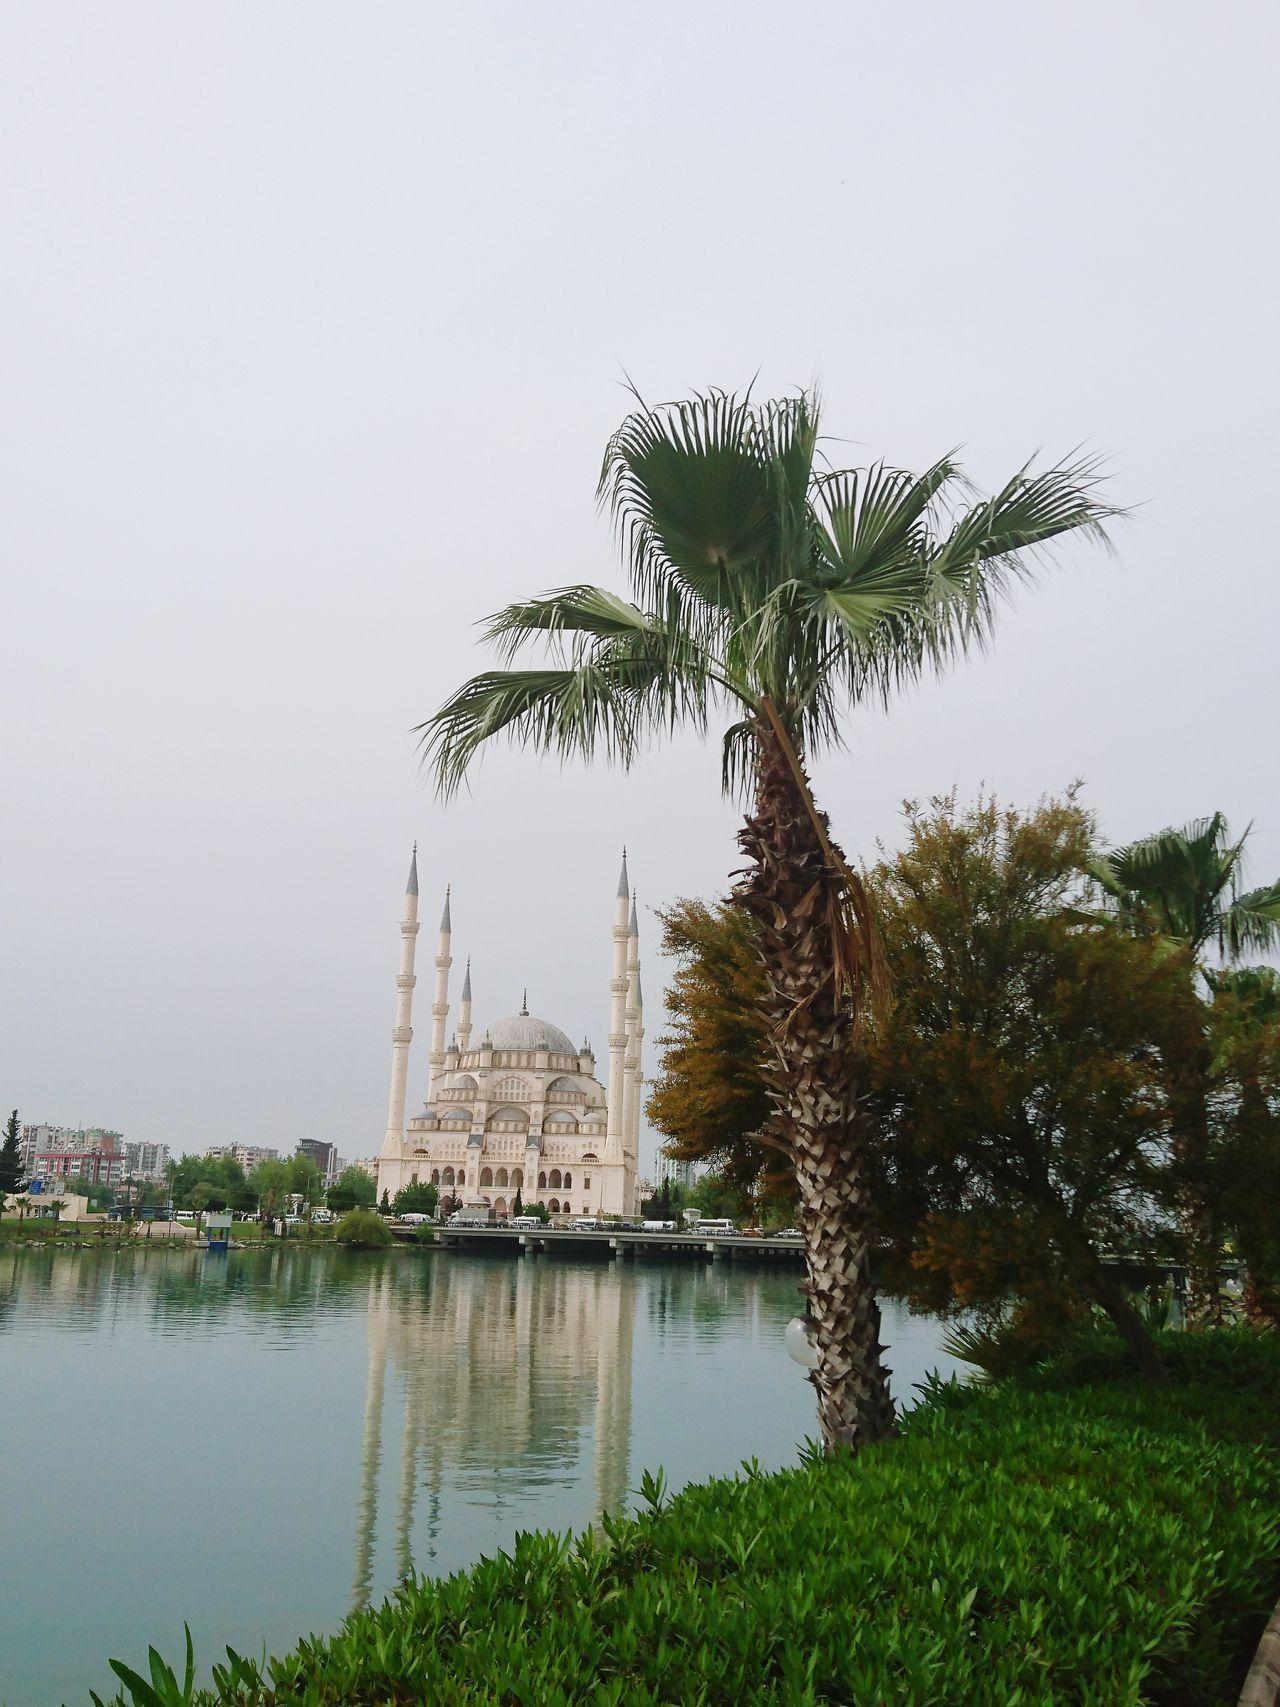 Adana Cityscape Citylandscape Merkez Camii Mosque Nehir Seyhannehri River Riverscape Riverside Riverside Photography Zamanidurdur